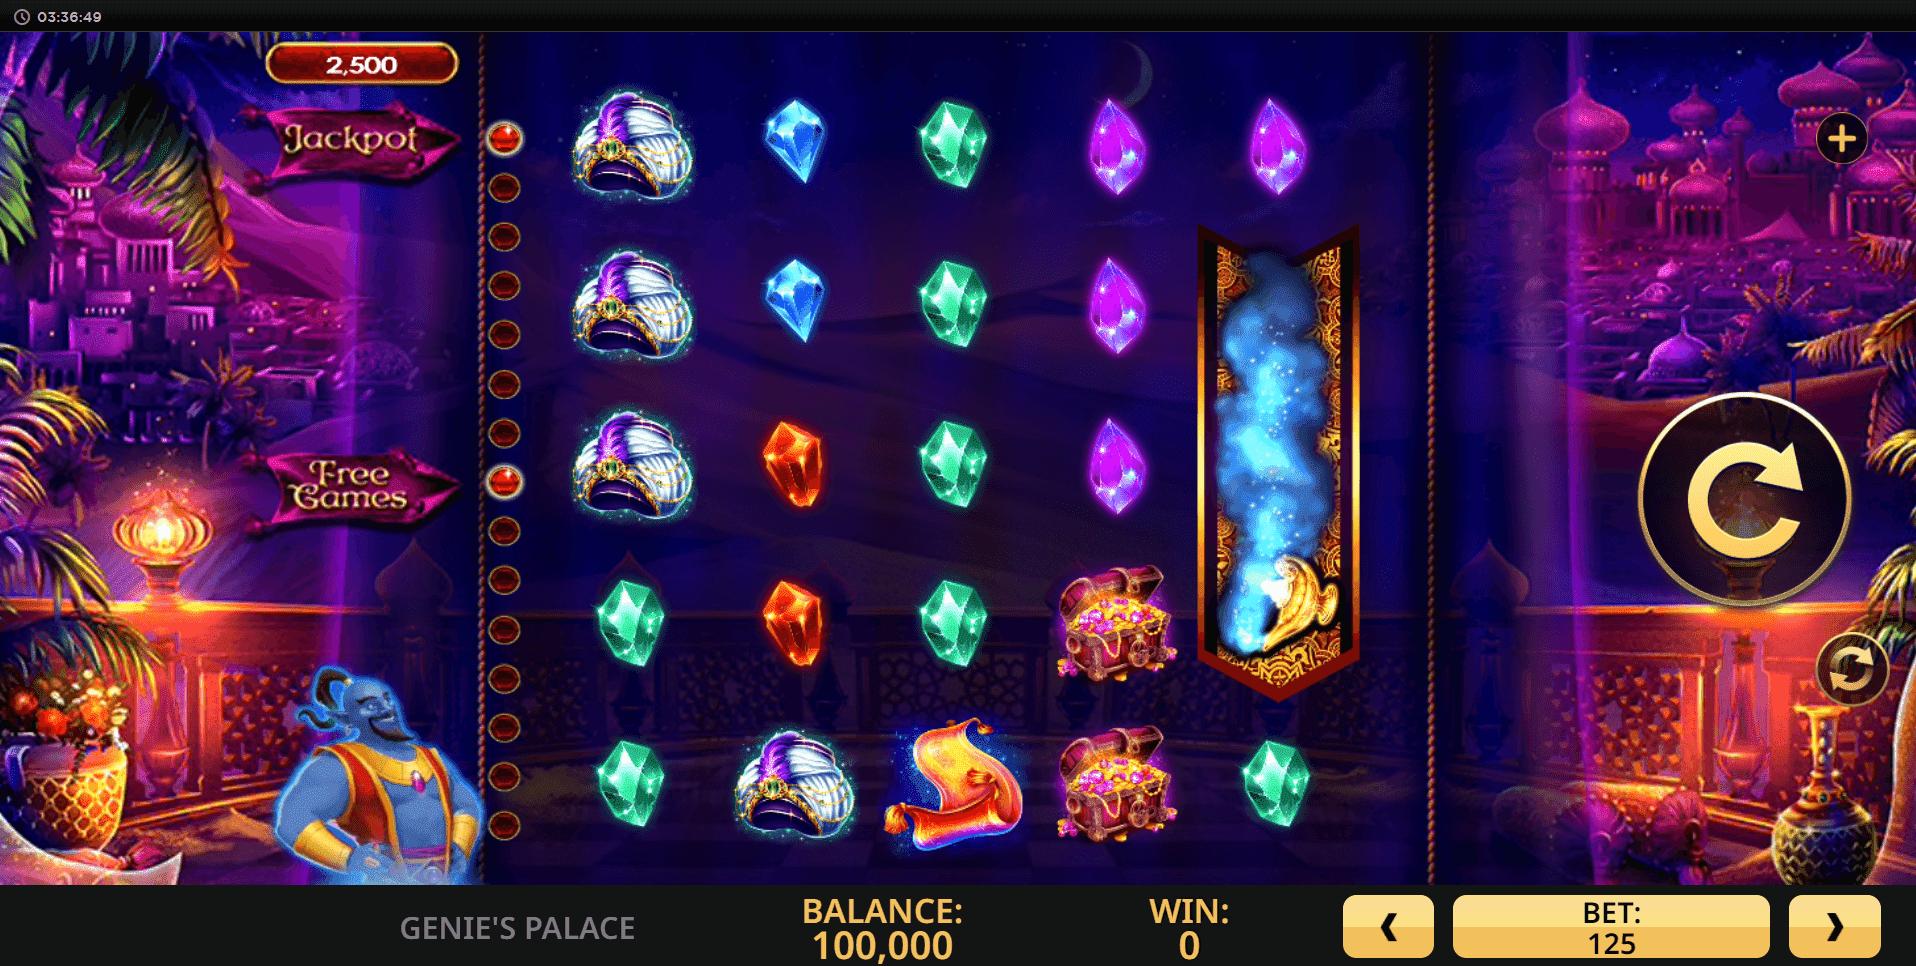 Genies Palace slot machine screenshot